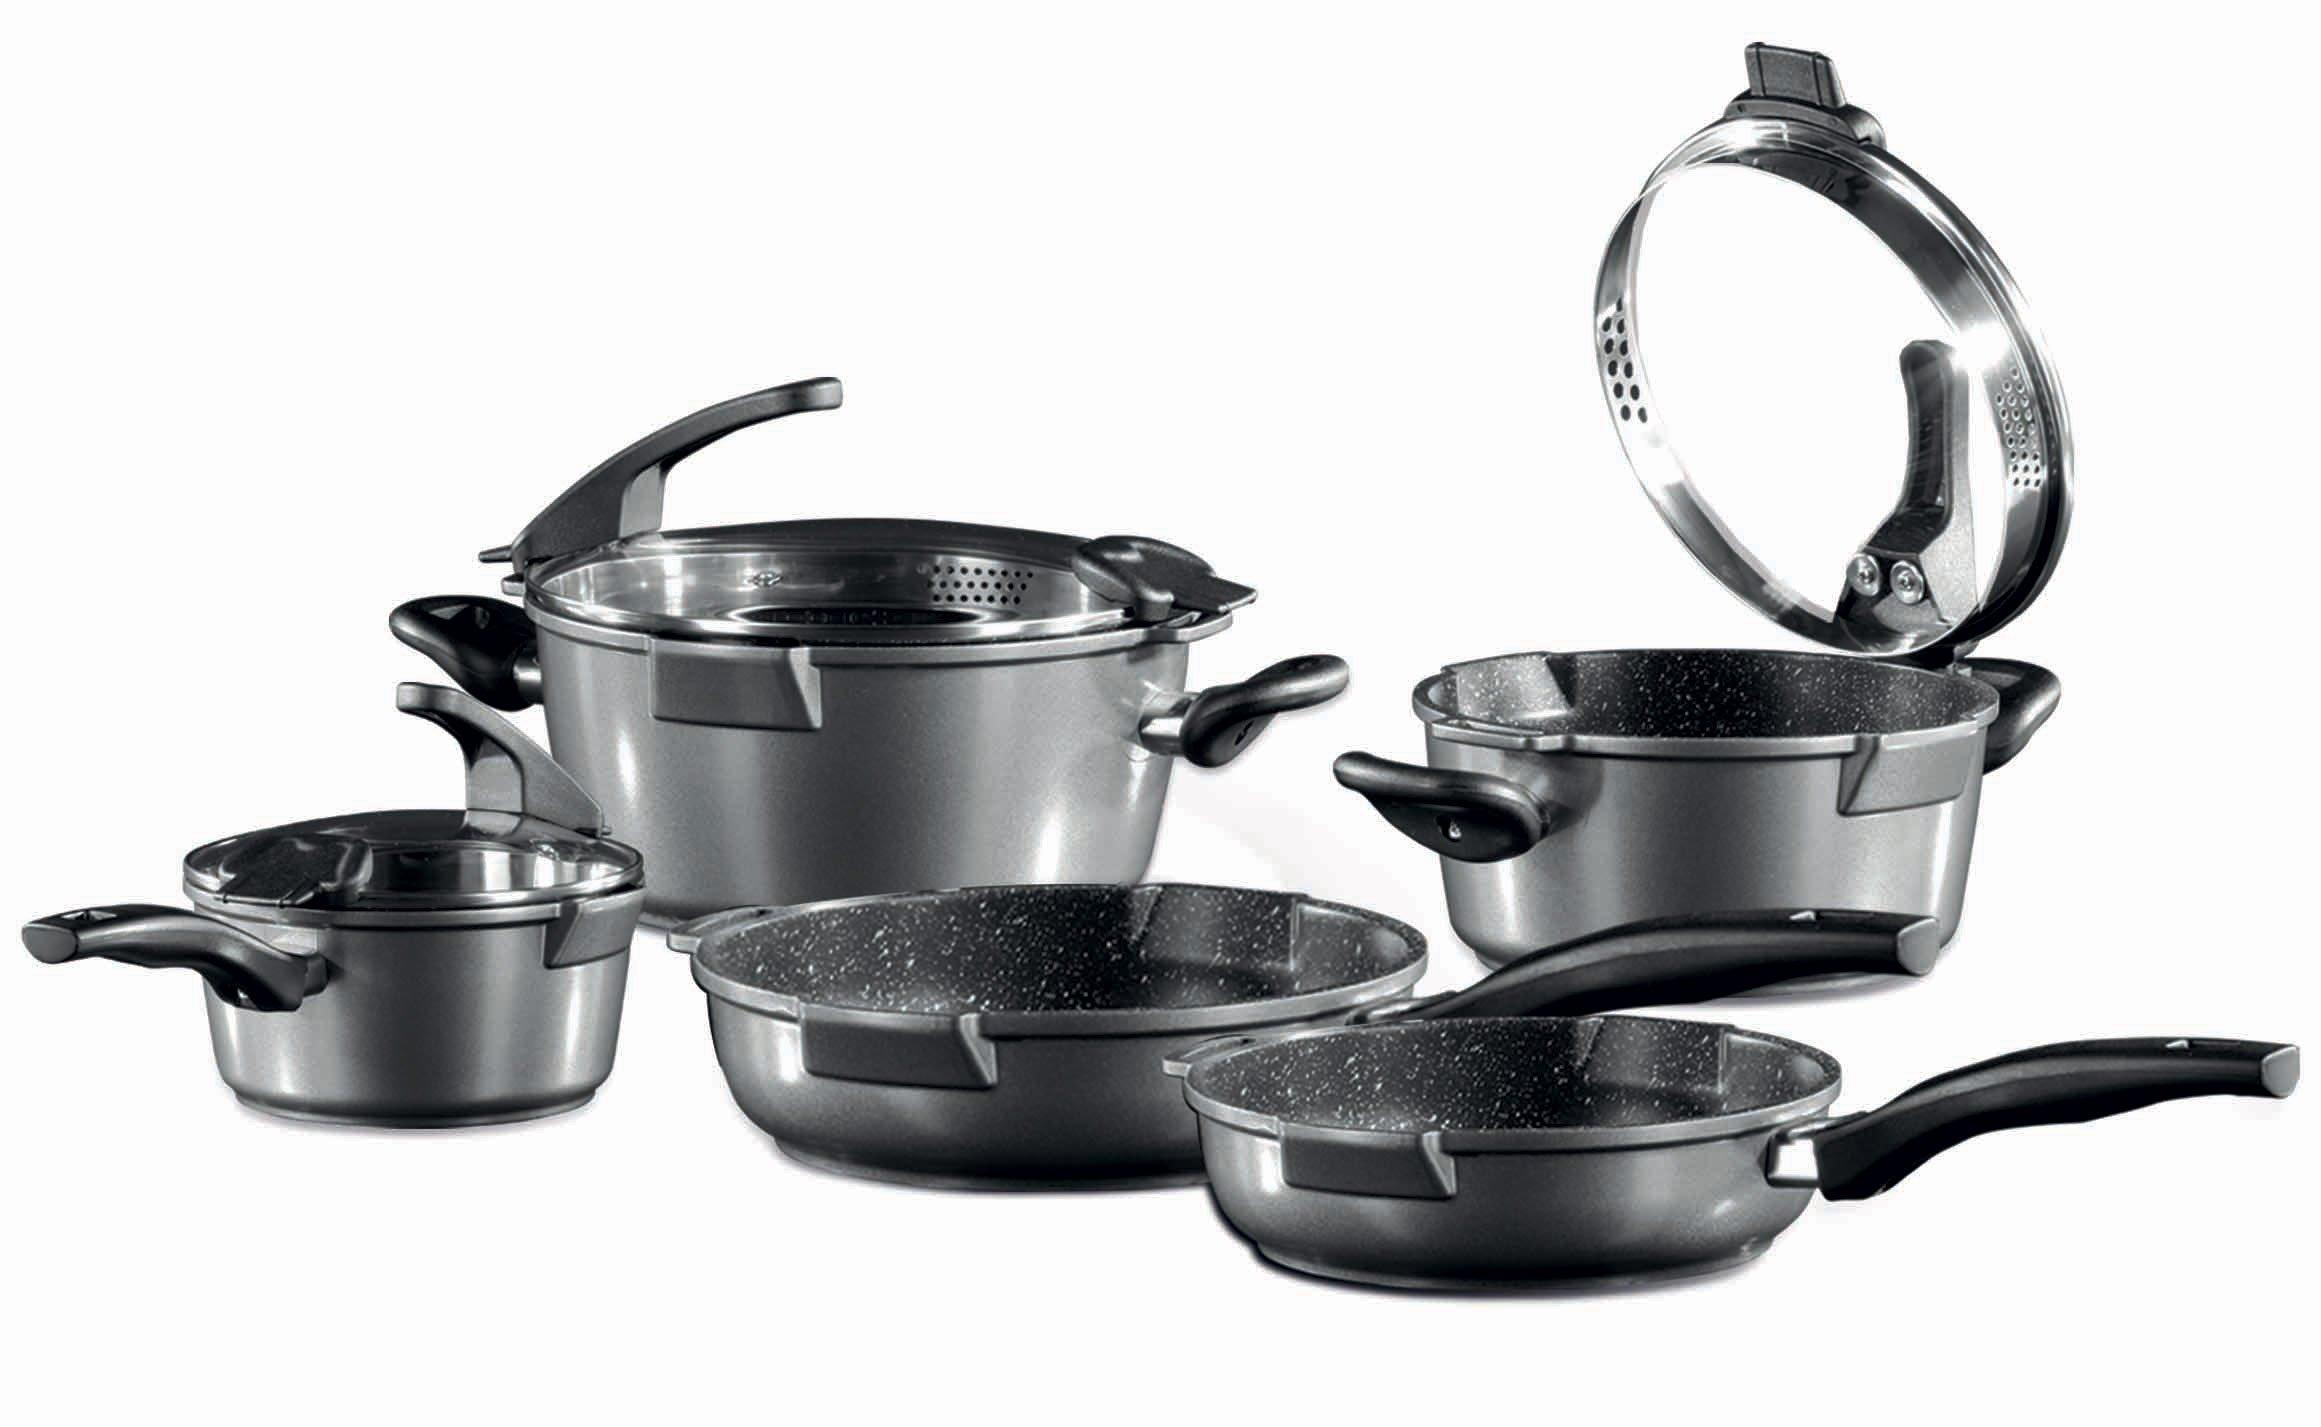 Germanys Stoneline Non stick Non Toxic Cookware